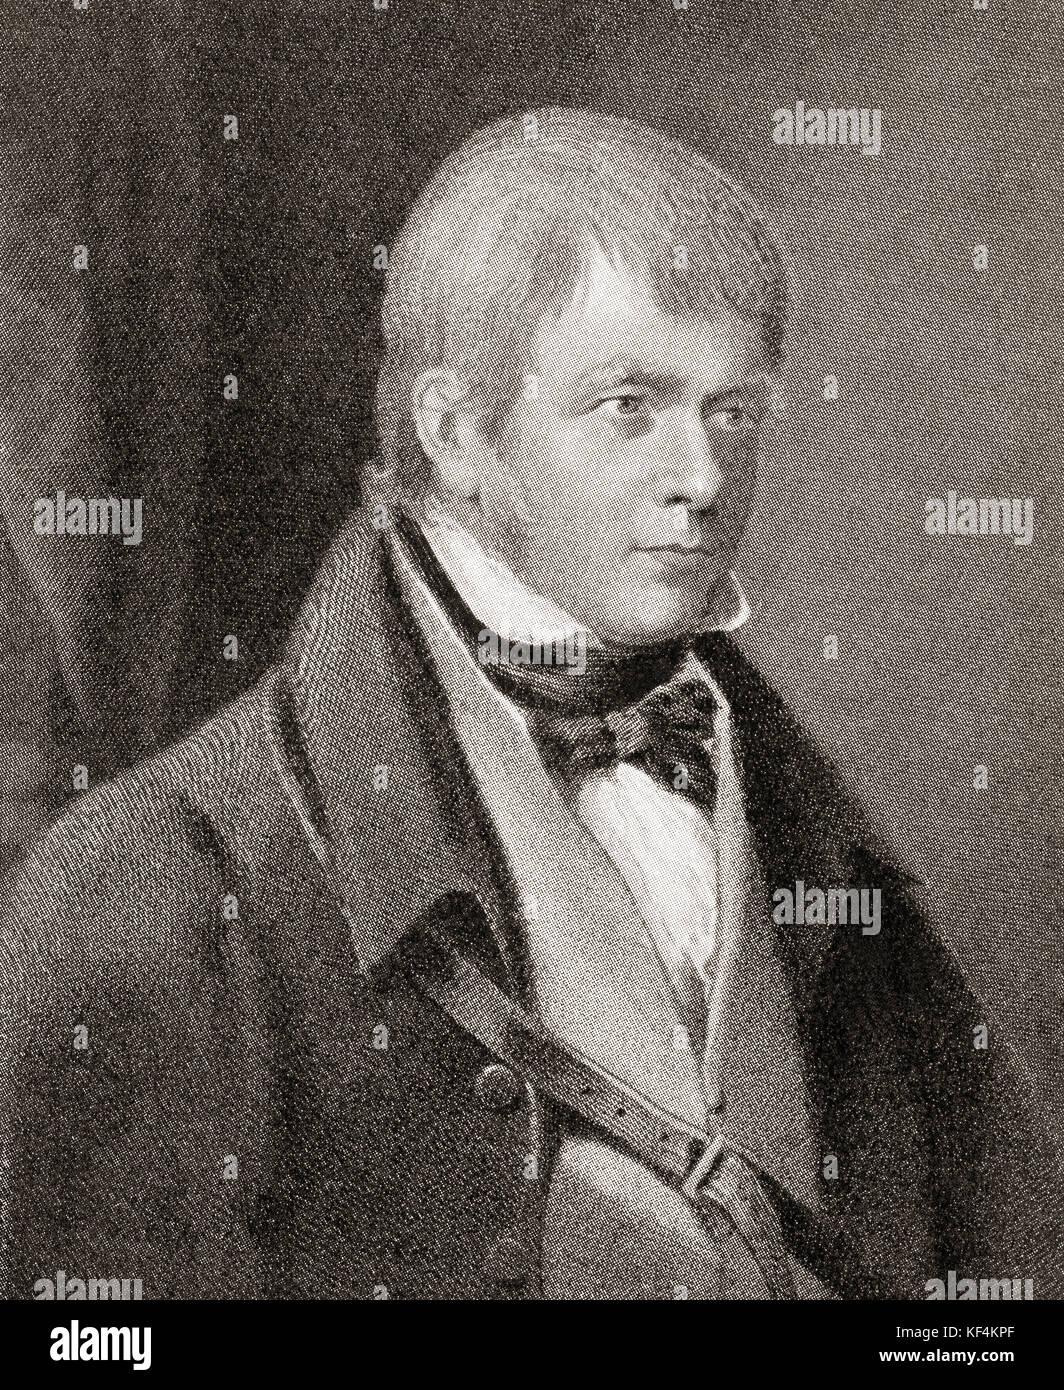 Sir Walter Scott, 1º baronet, 1771 - 1832. histórico escocés, novelista, dramaturgo y poeta. de Hutchinson Imagen De Stock